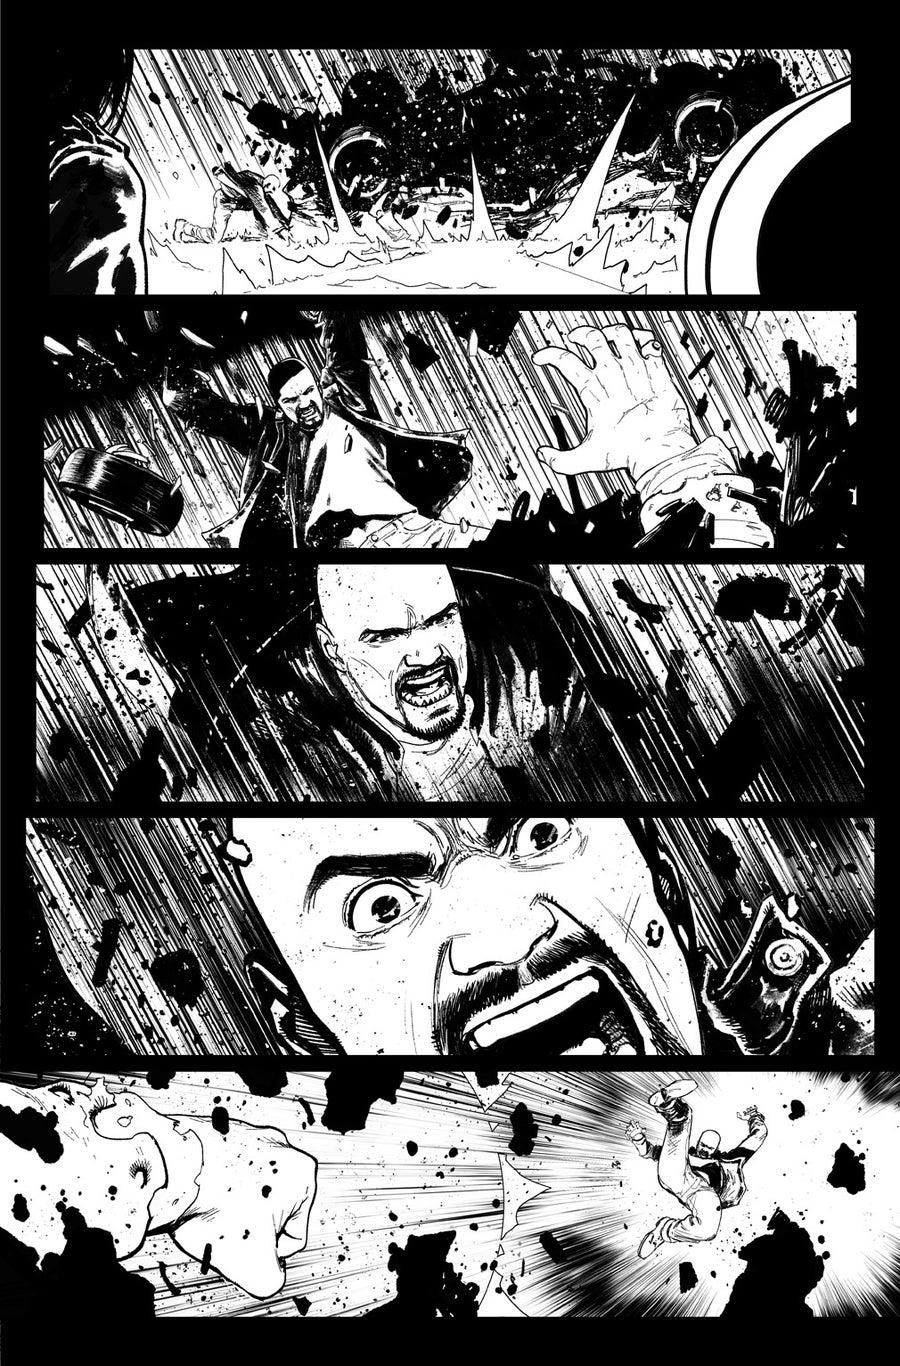 Image of DEFENDERS #9, p.15 ARTIST'S PROOF